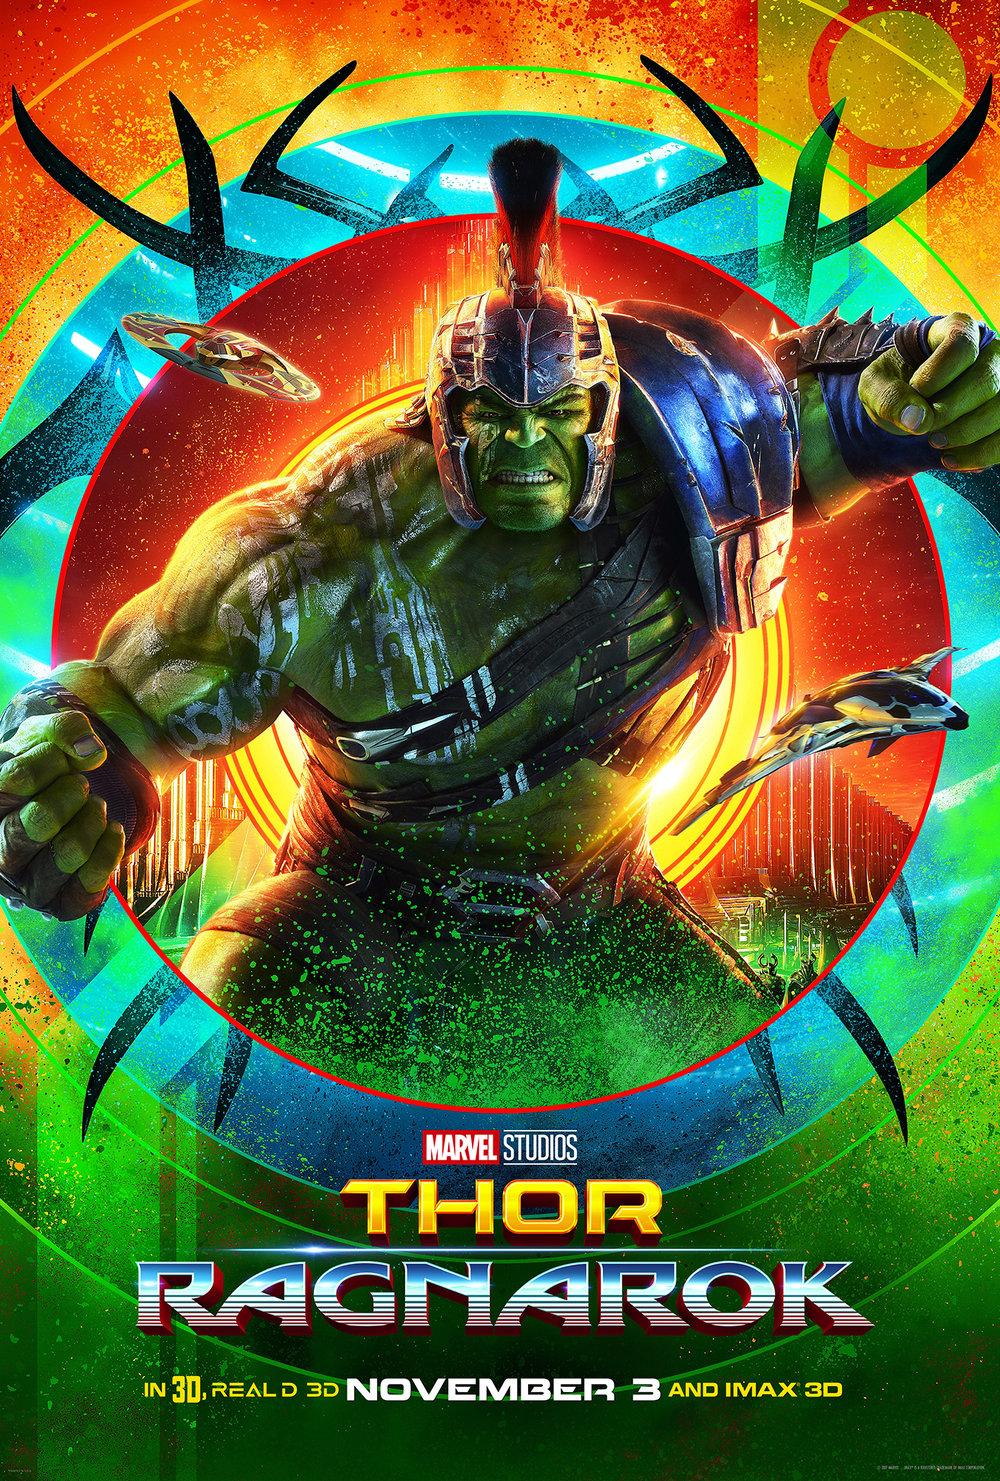 Thor_Swirl_1-Sht_Hulk_v1.jpg